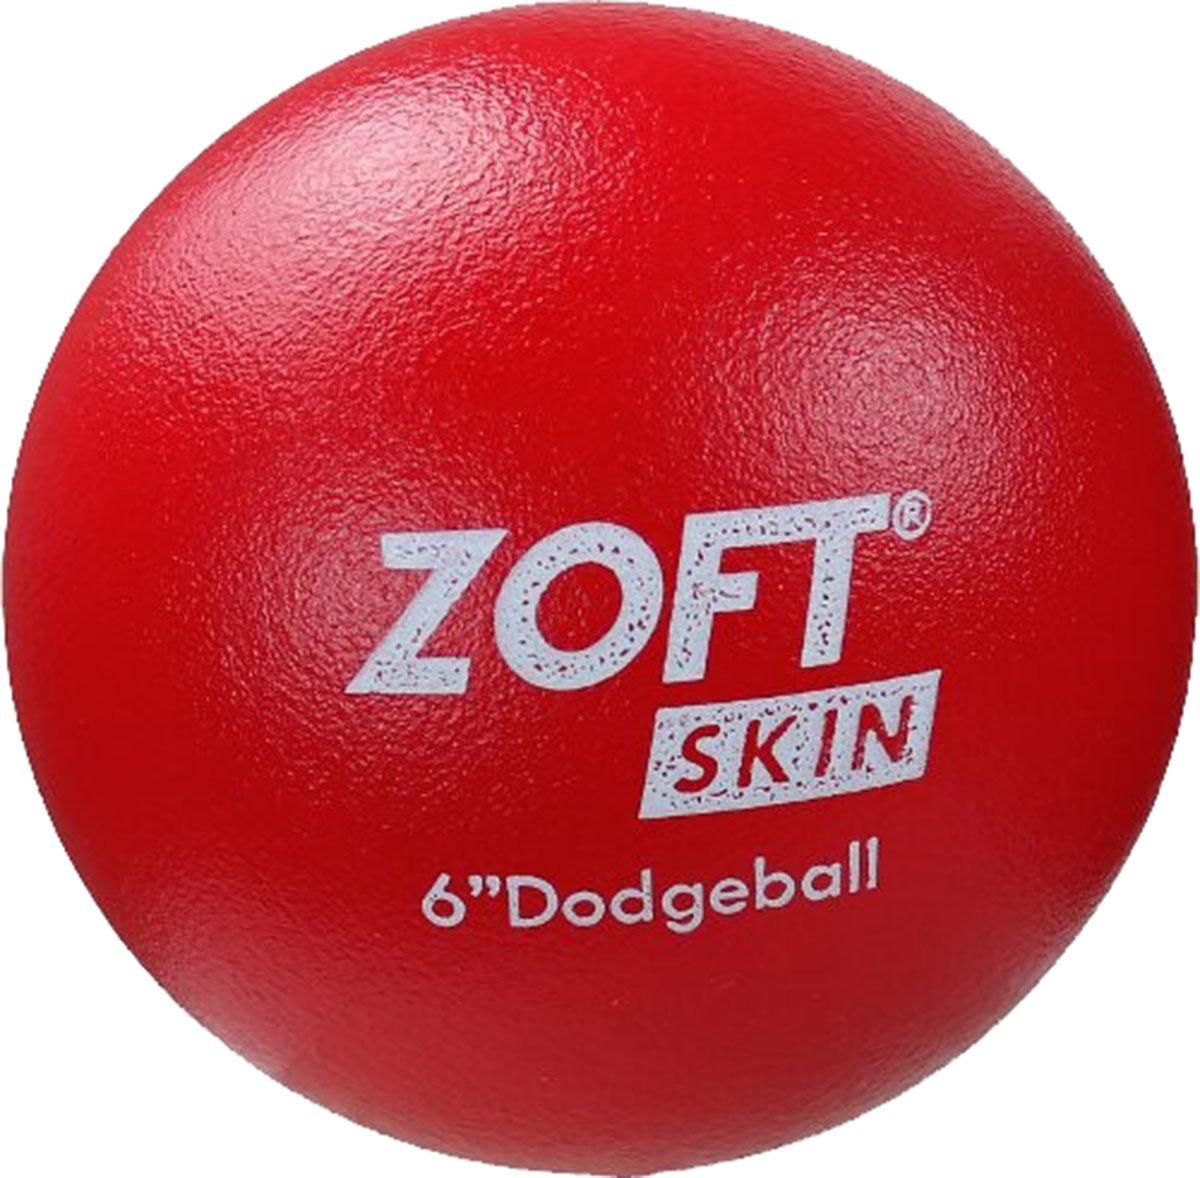 Zoftskin Dodgeball 152mm (6'')